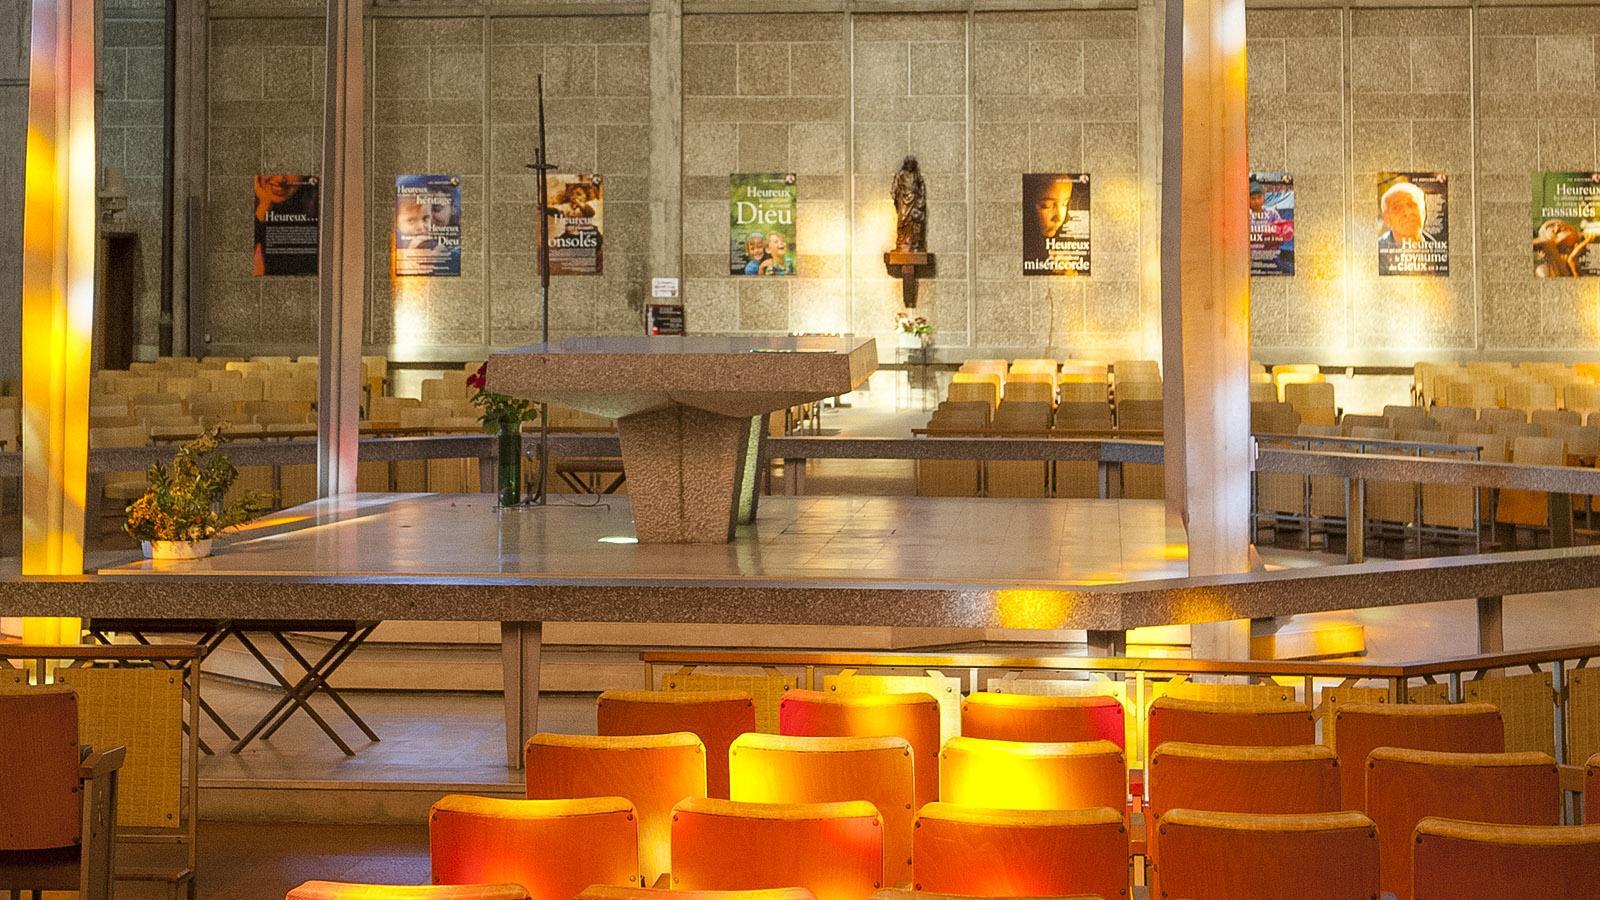 Église Saint-Joseph, Le Havre: Kirchenraum mit Altar. Foto: Hilke Maunder